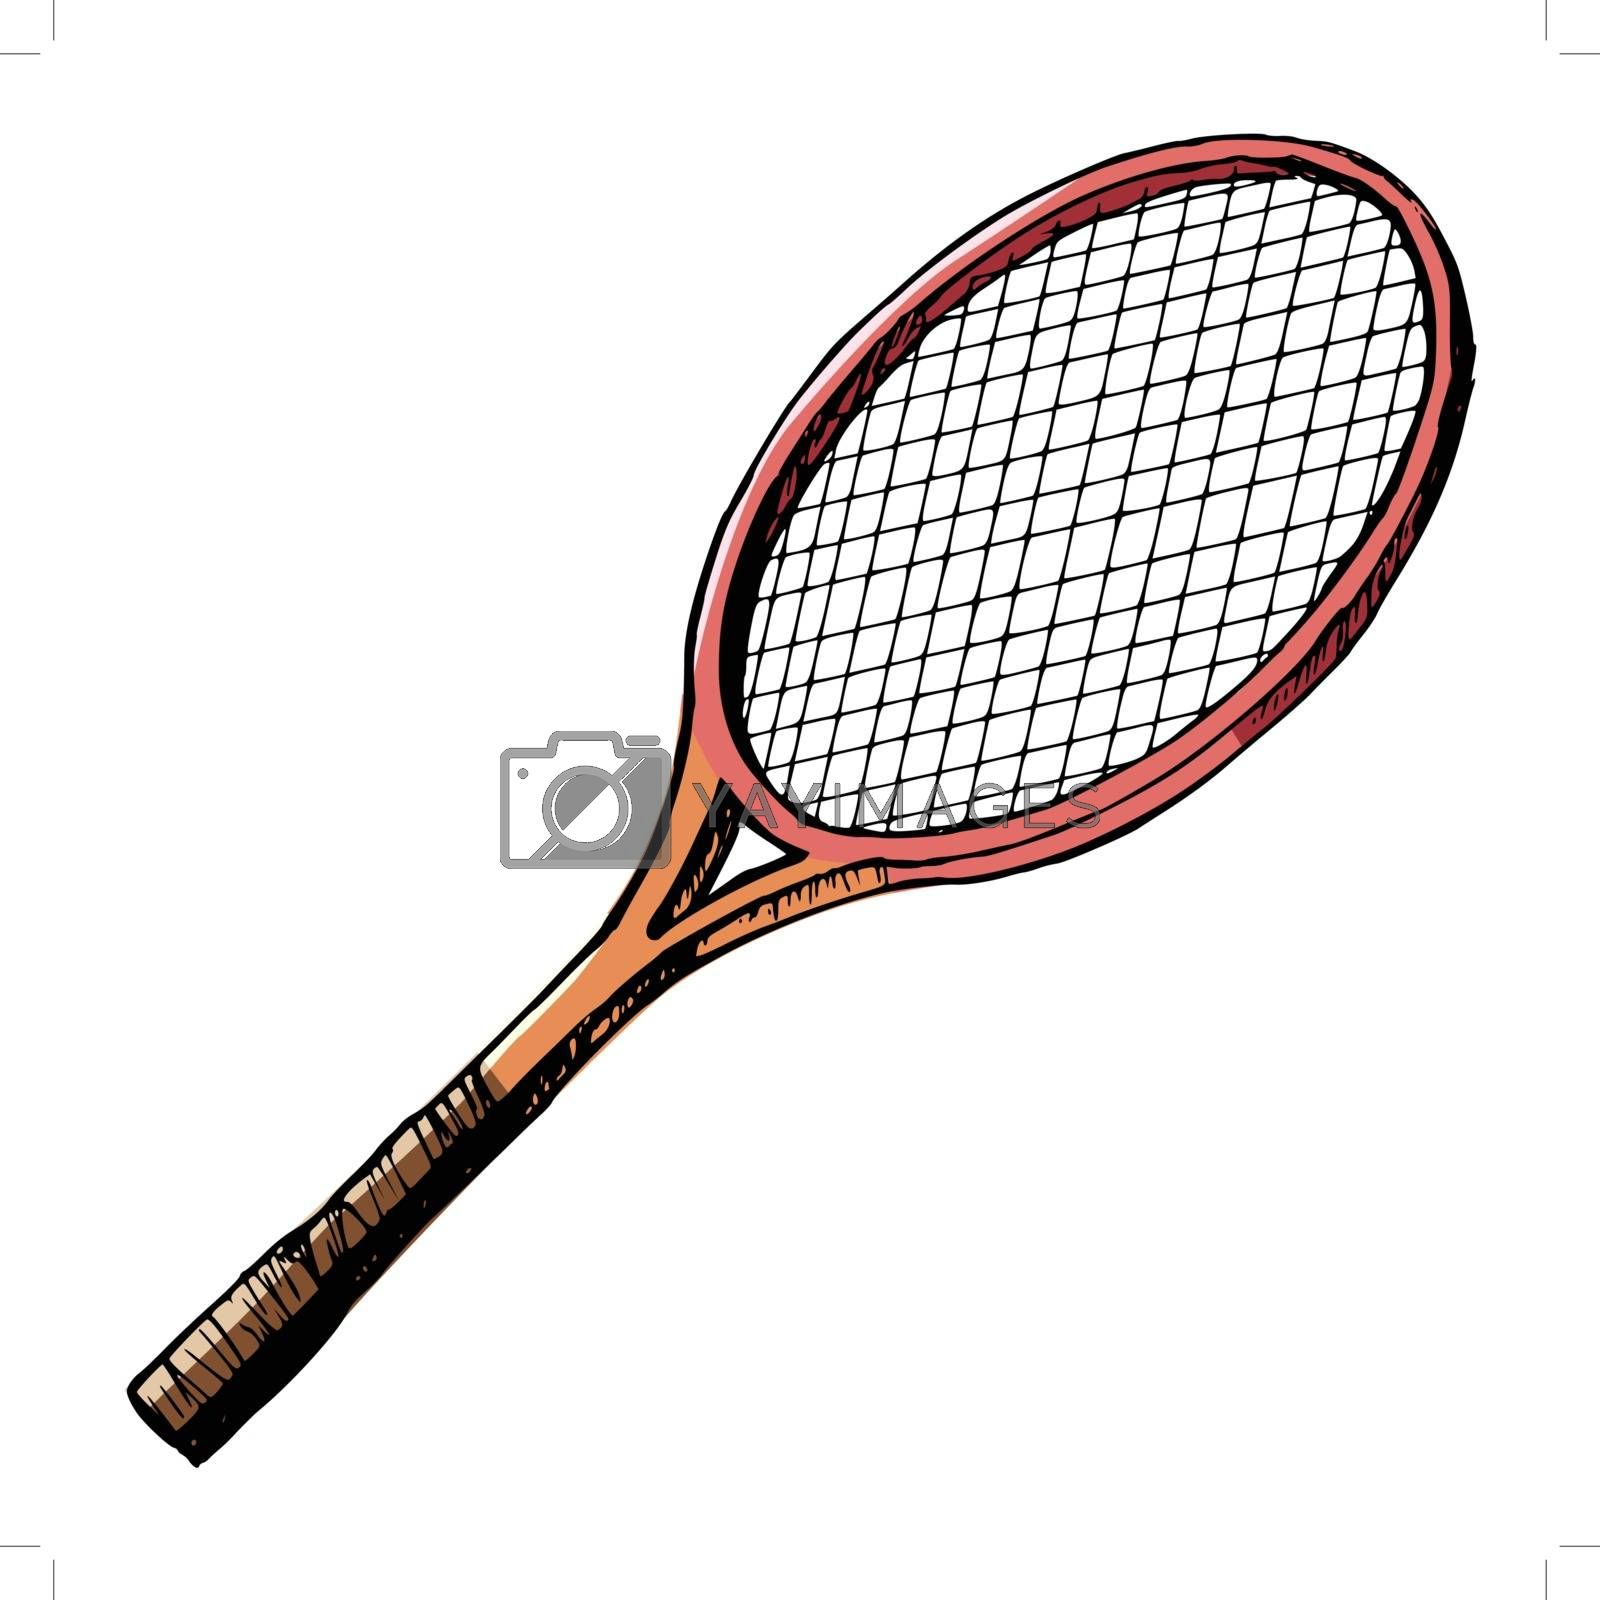 hand drawn, cartoon, sketch illustration of tennis bat